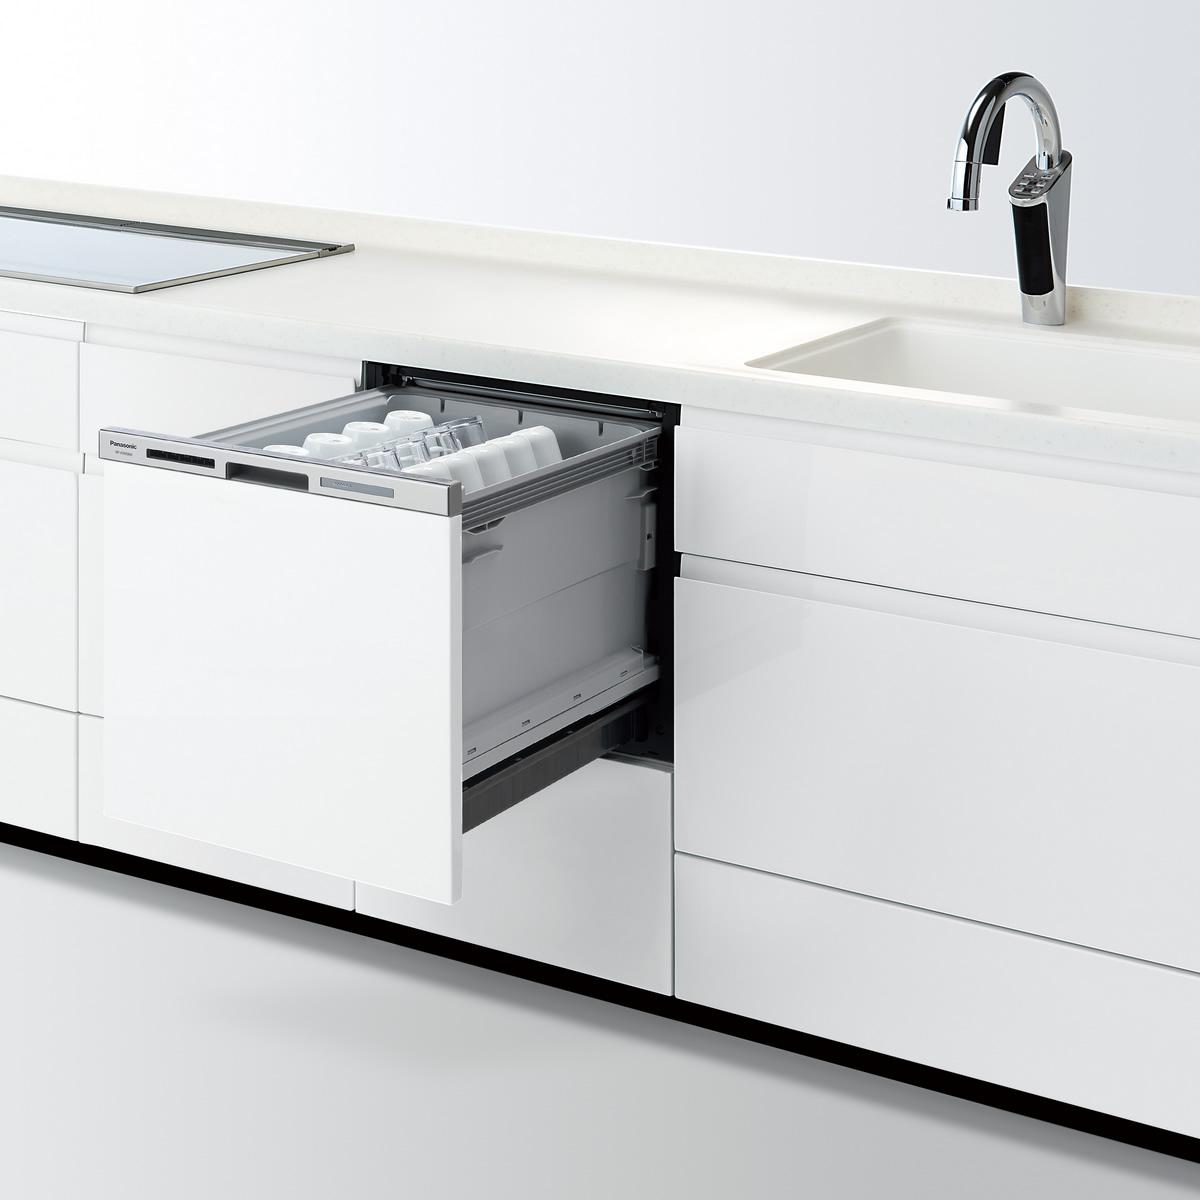 【NP-45MS8W】 パナソニック ビルトイン食器洗い乾燥機(食洗機) M8シリーズ 幅45cm ミドルタイプ ドア面材型